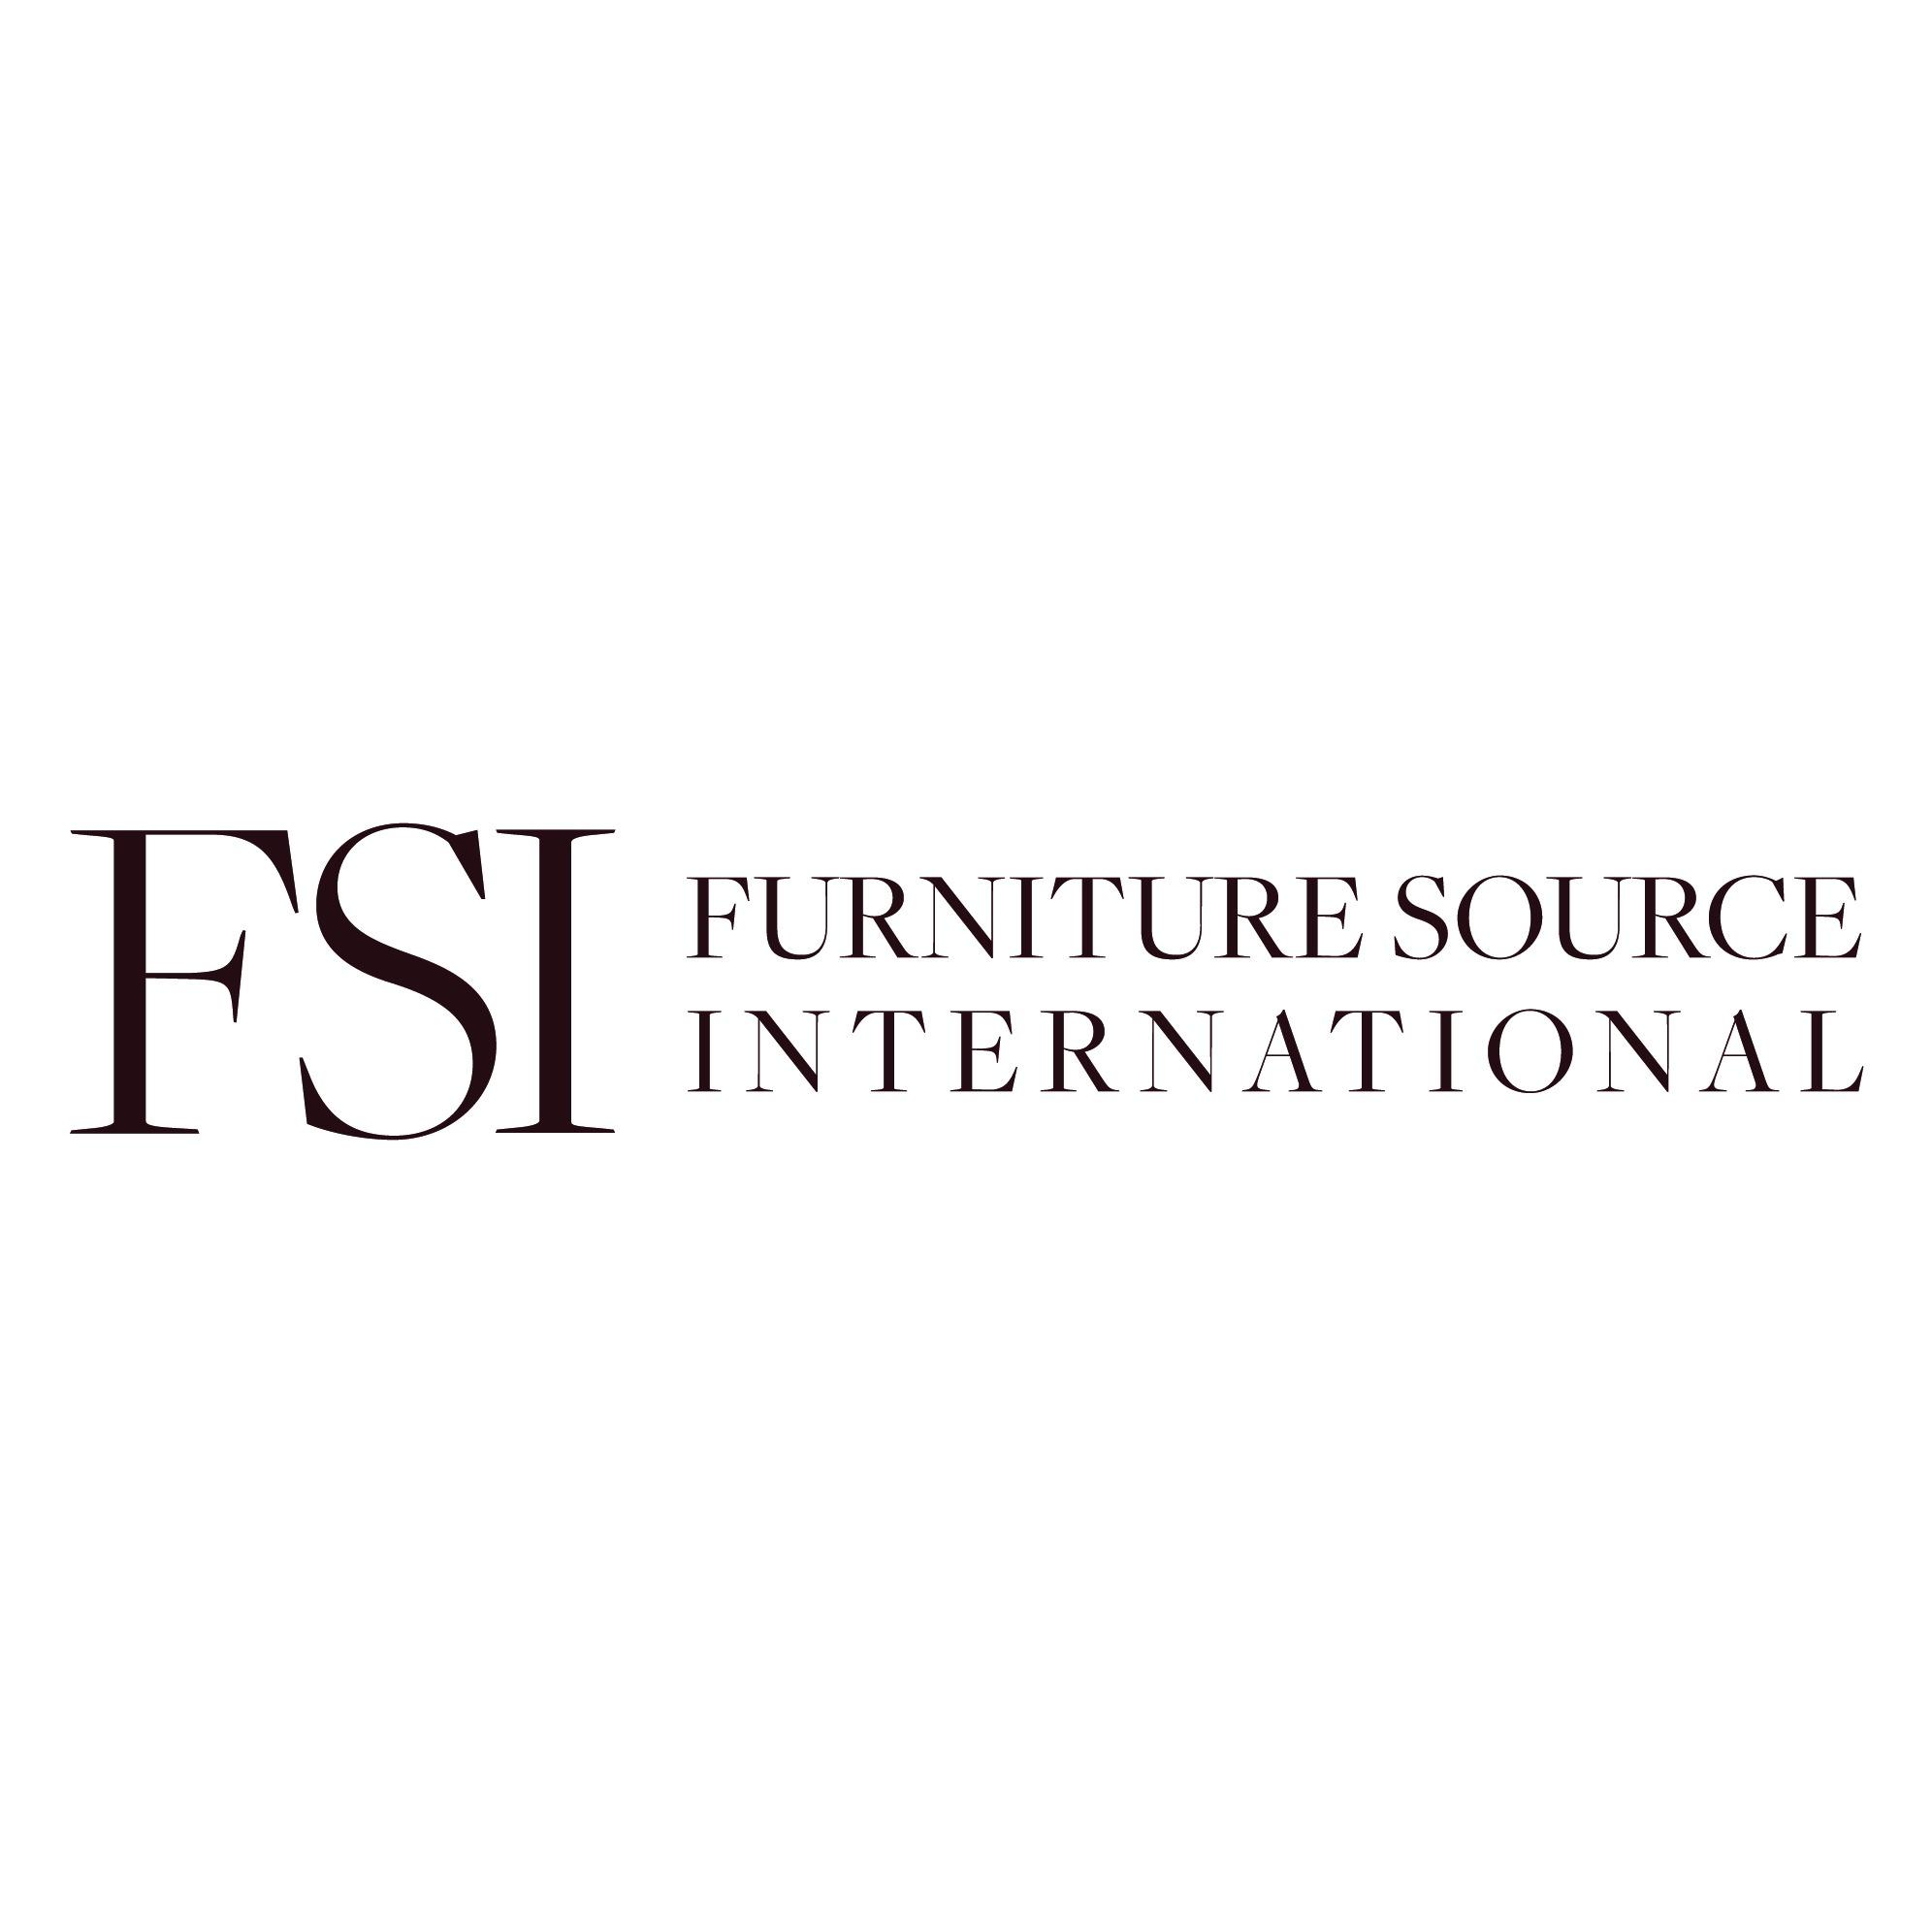 Furniture Source International